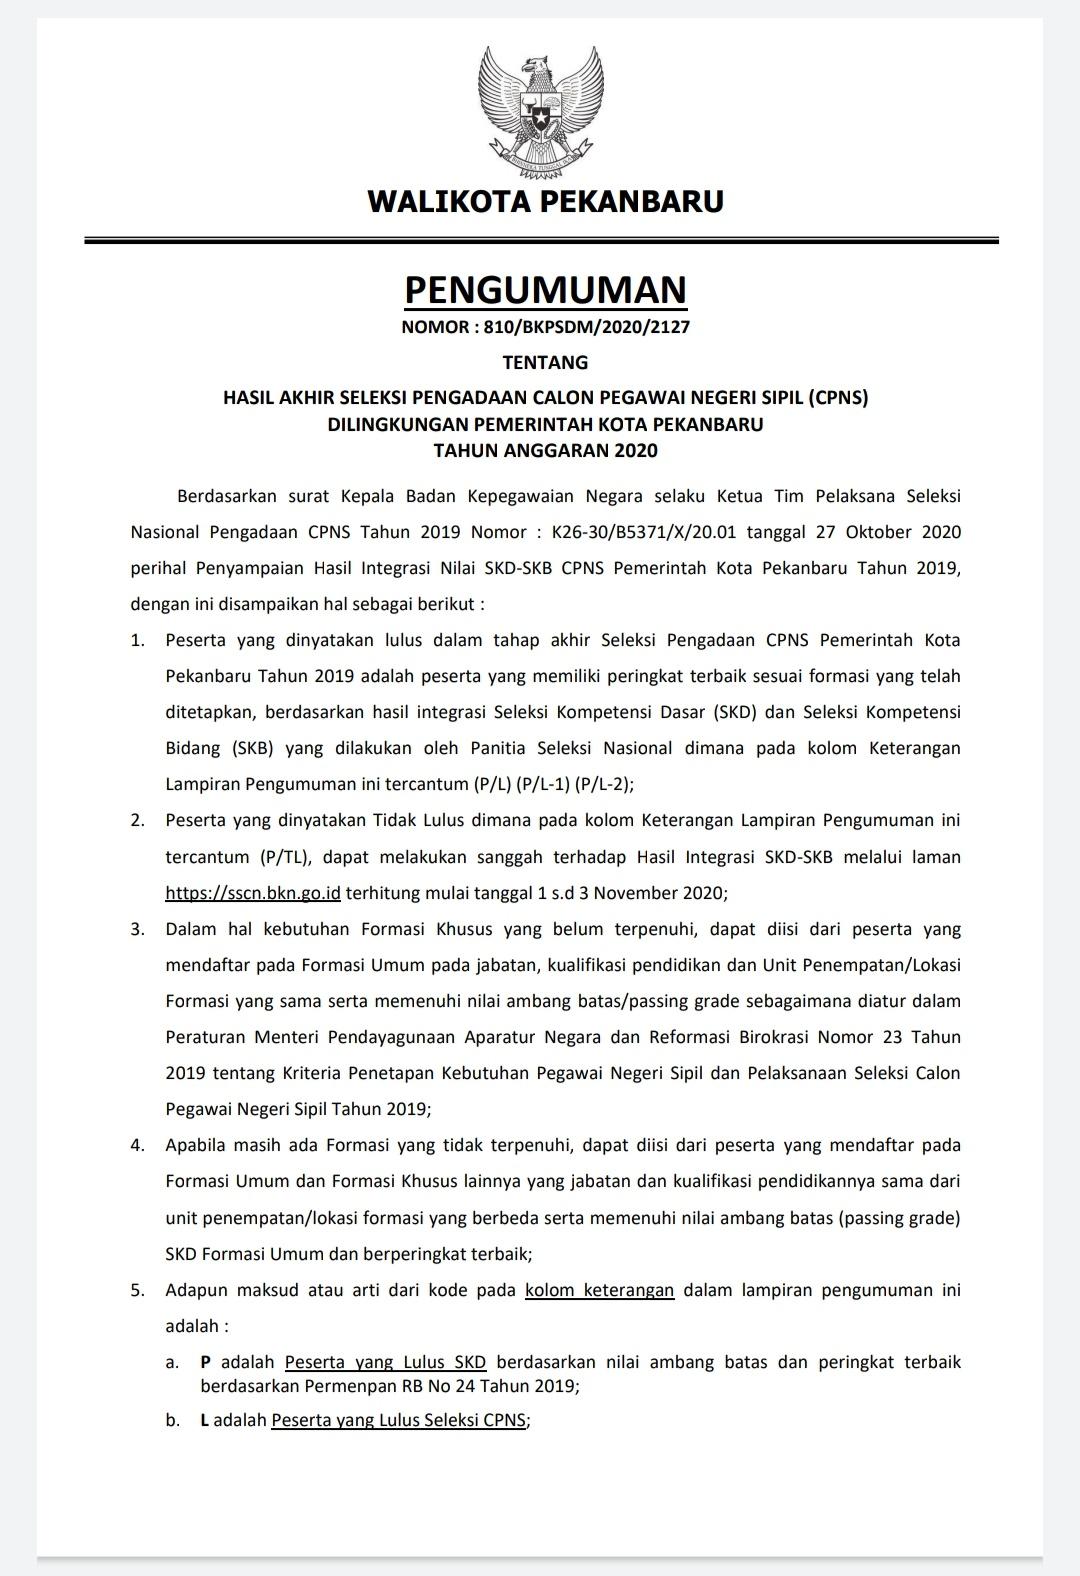 Image : 342 Peserta Lulus CPNS Tahun 2019 Kota Pekanbaru